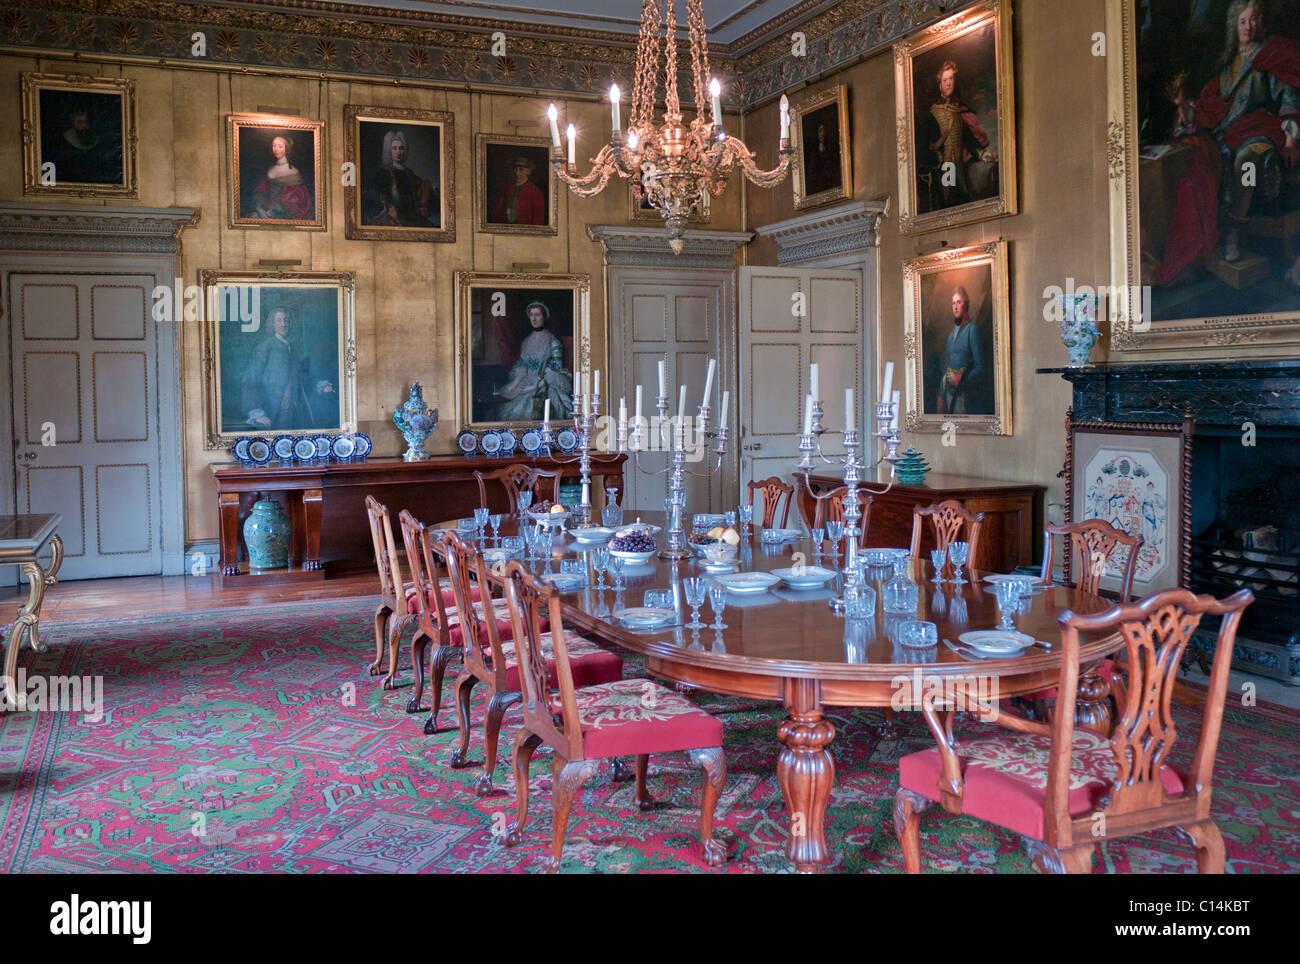 DINING ROOM HOPETOUN HOUSE  EDINBURGH SCOTLAND  UNITED KINGDOM Stock Photo